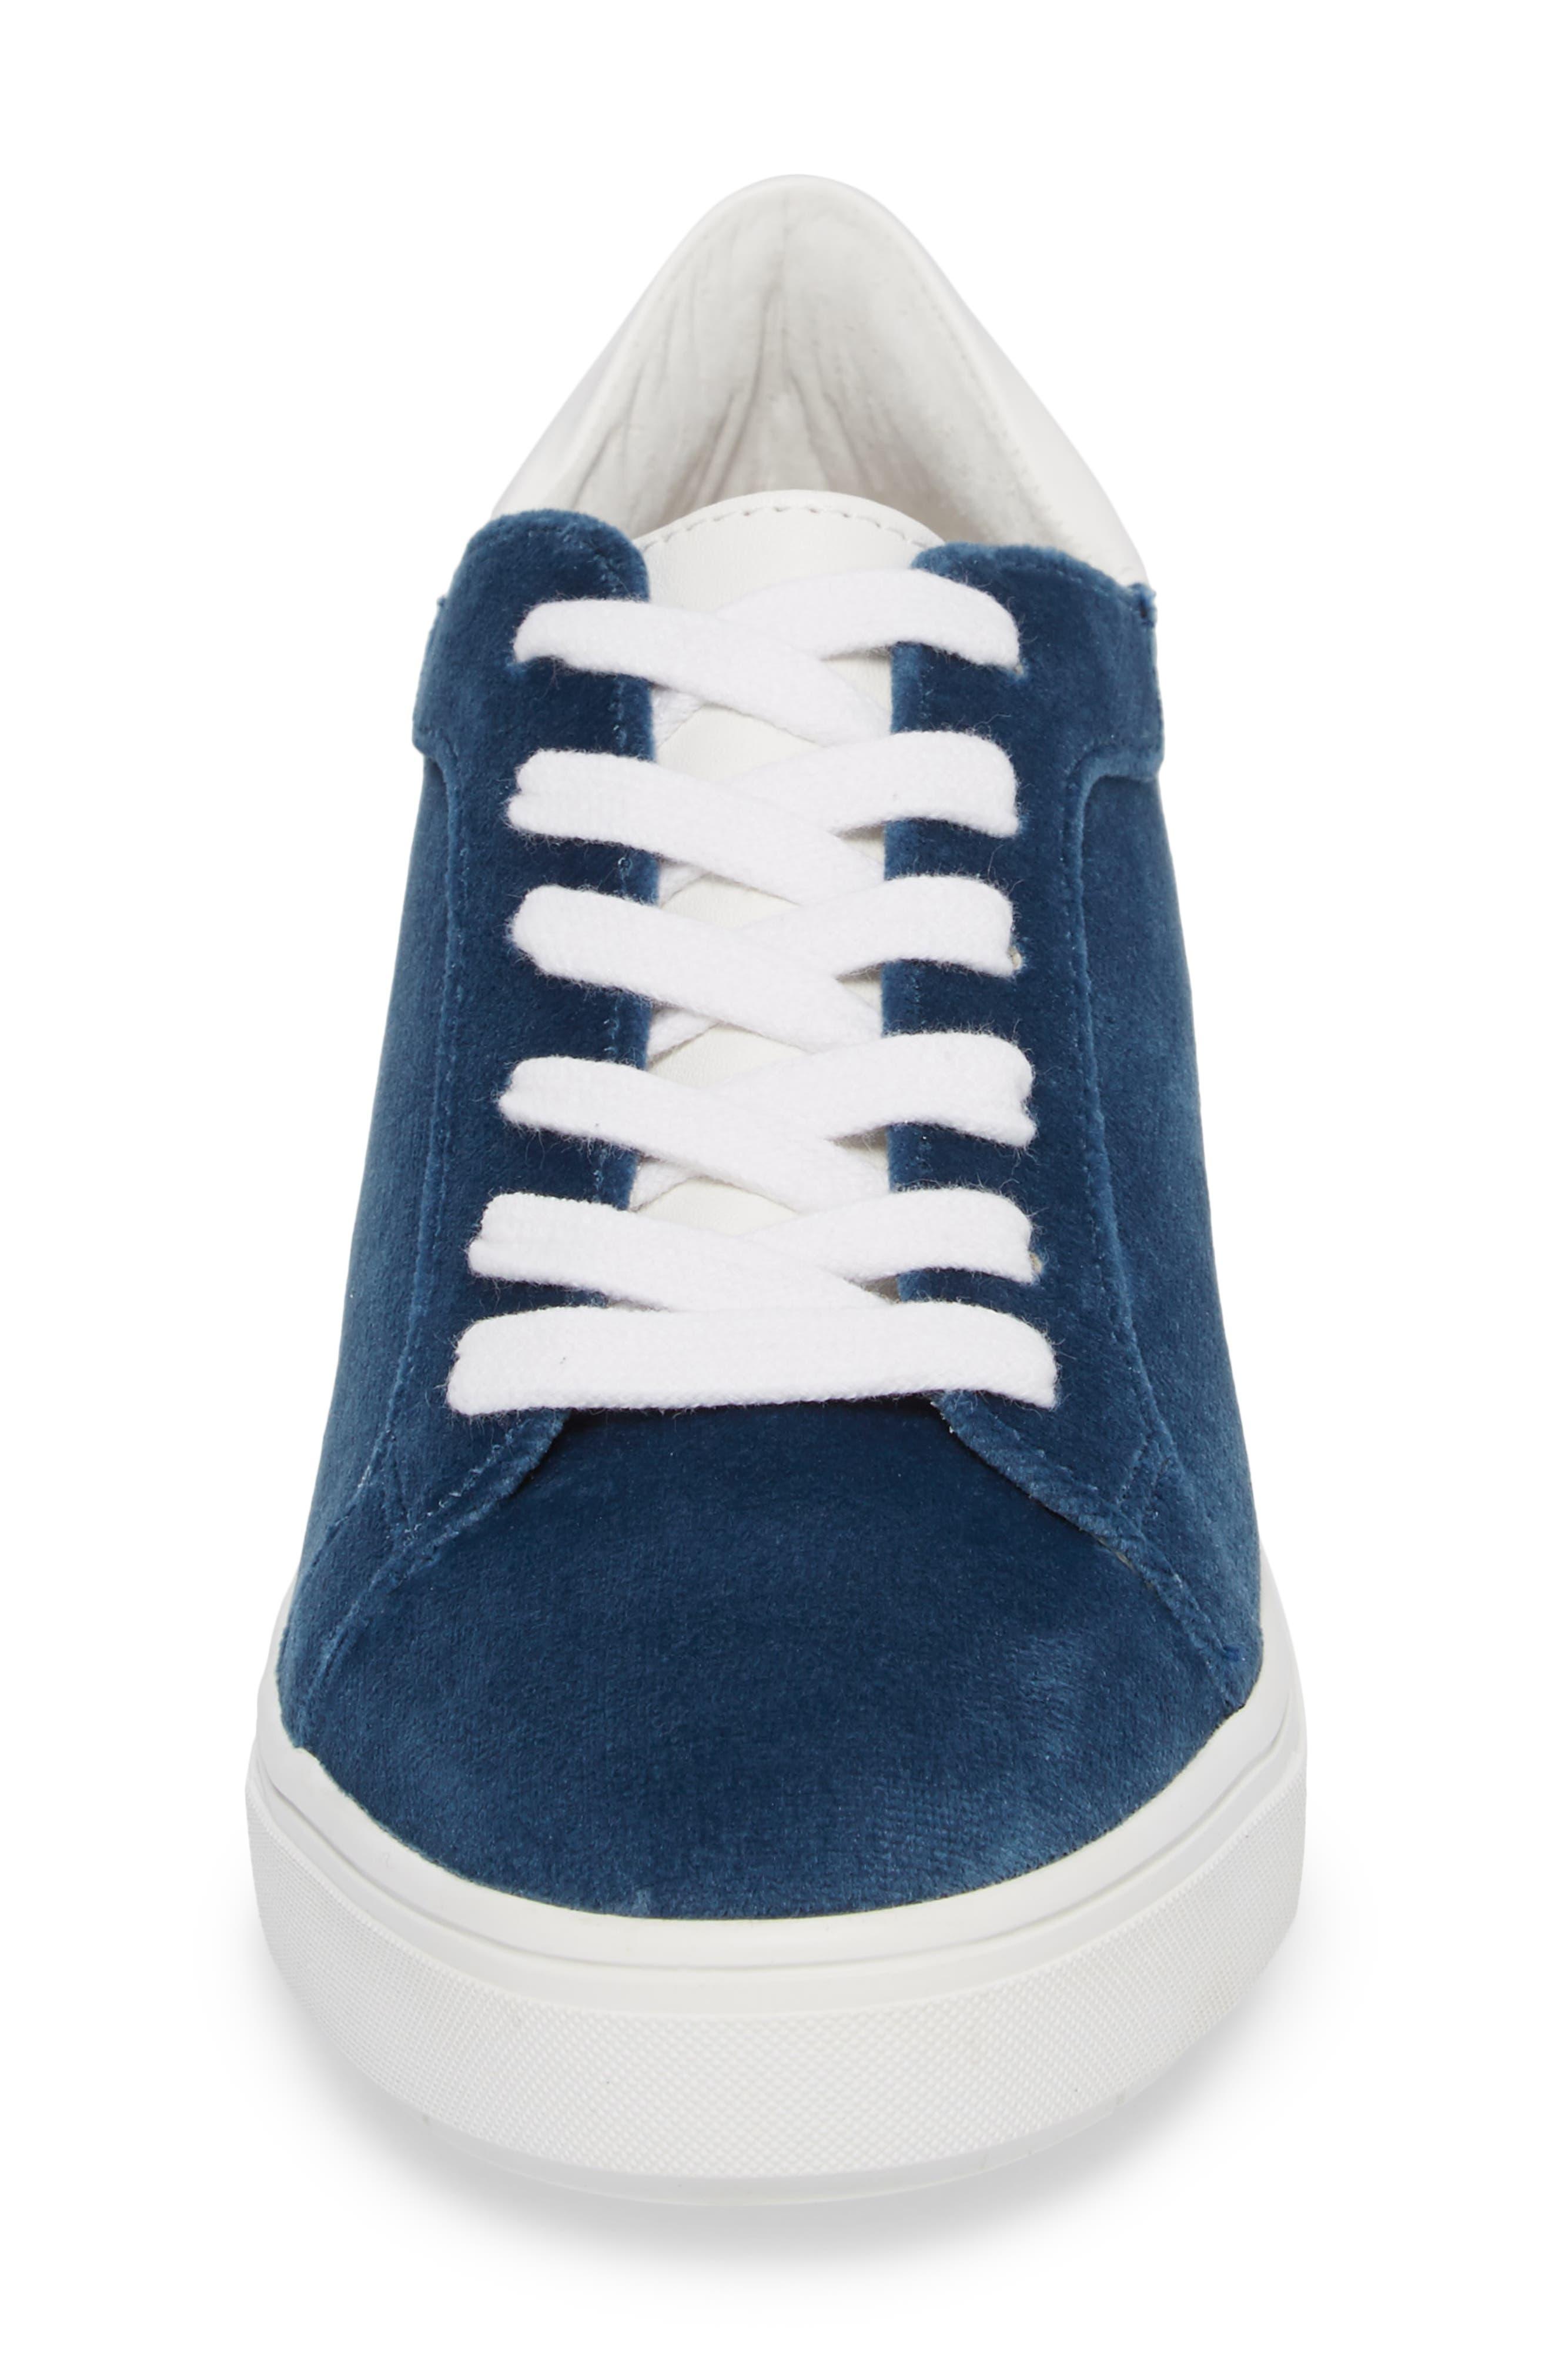 Alternate Image 4  - Steve Madden Steal Concealed Wedge Sneaker (Women)